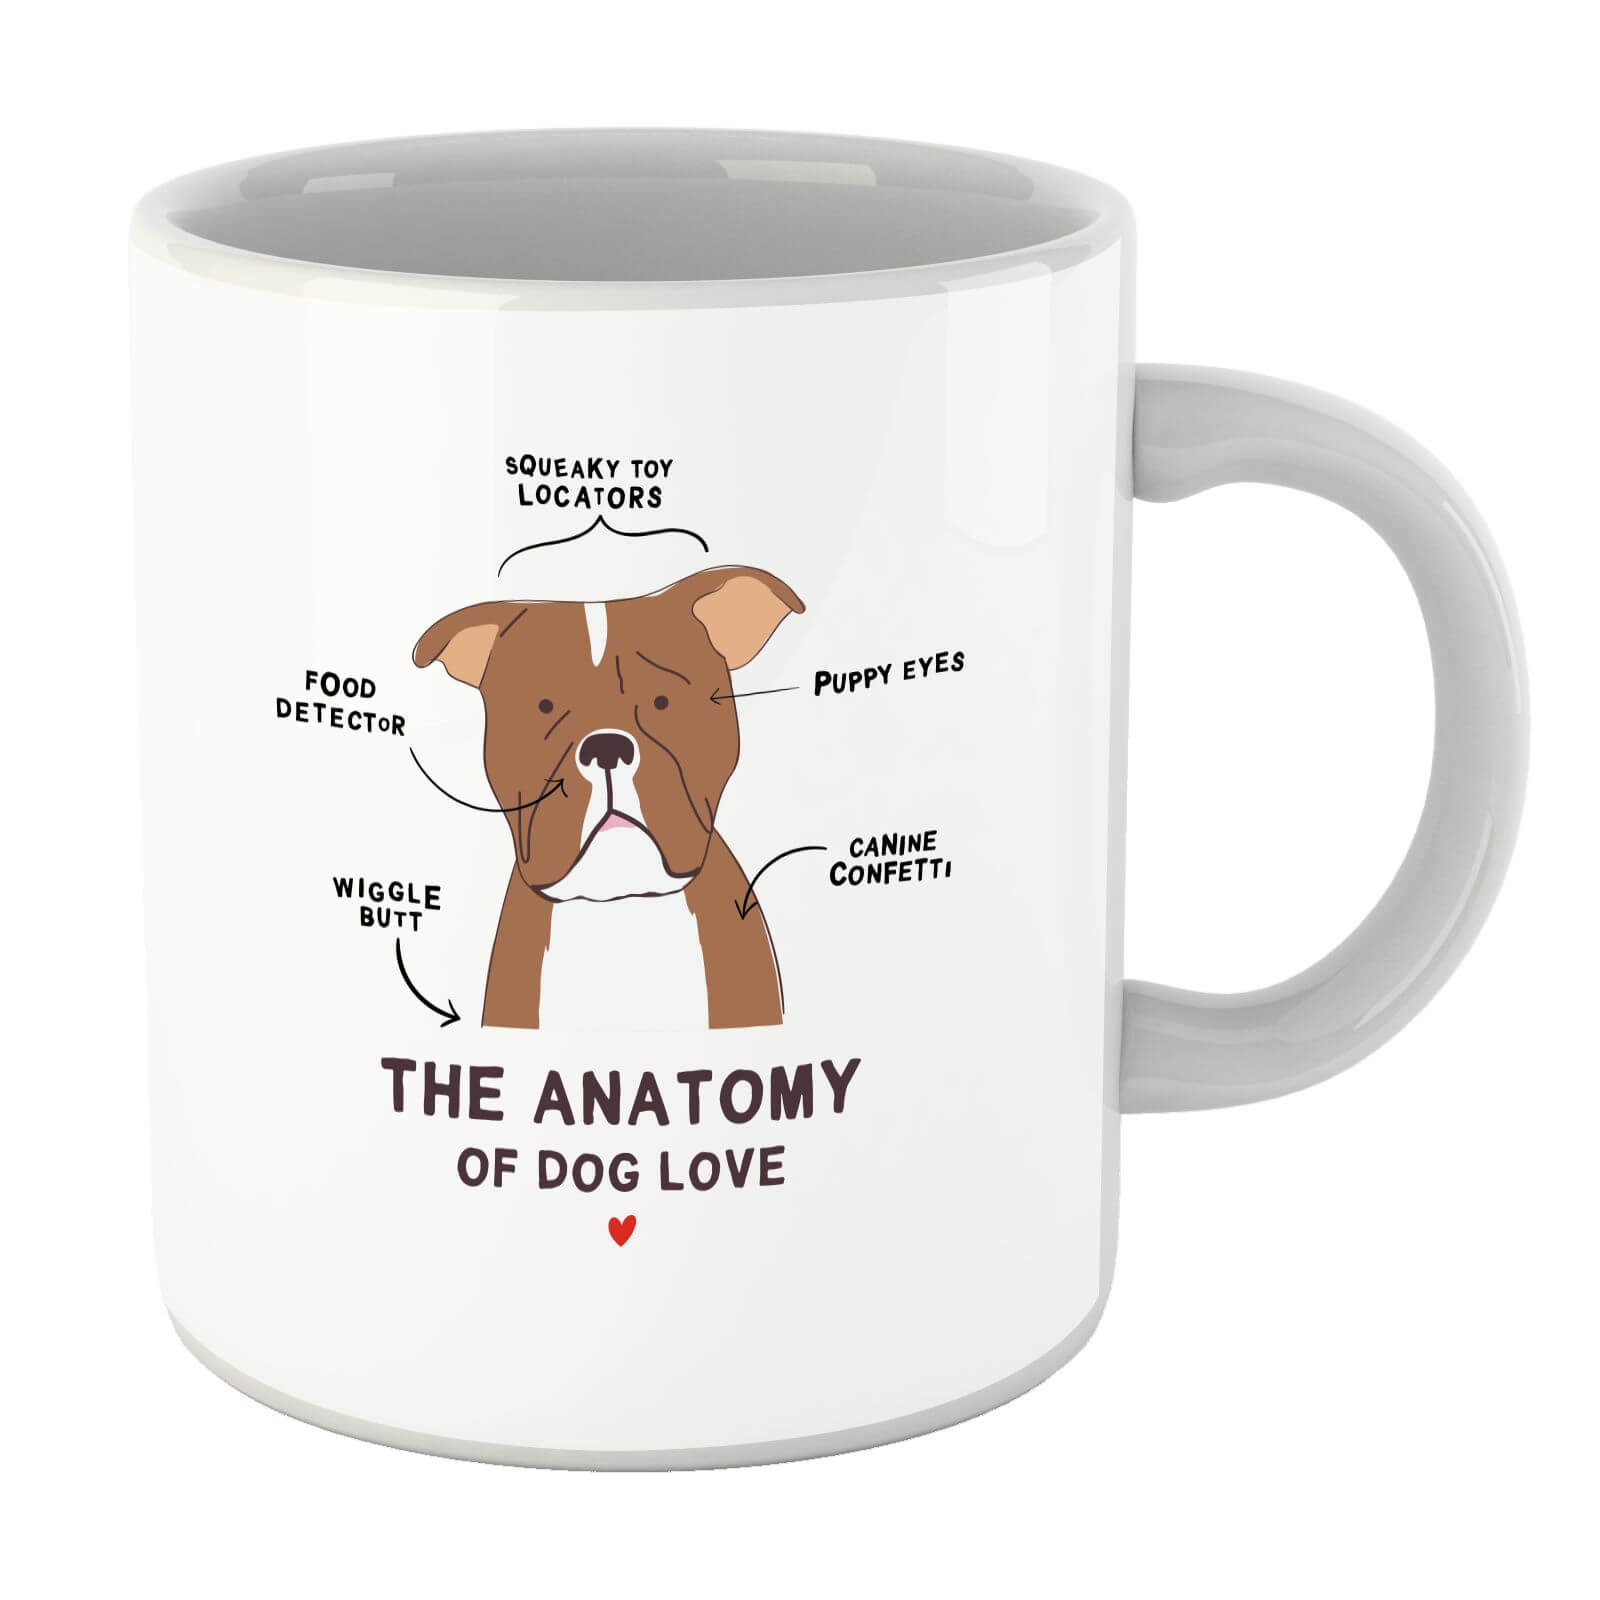 The Anatomy Of Dog Love Mug | IWOOT